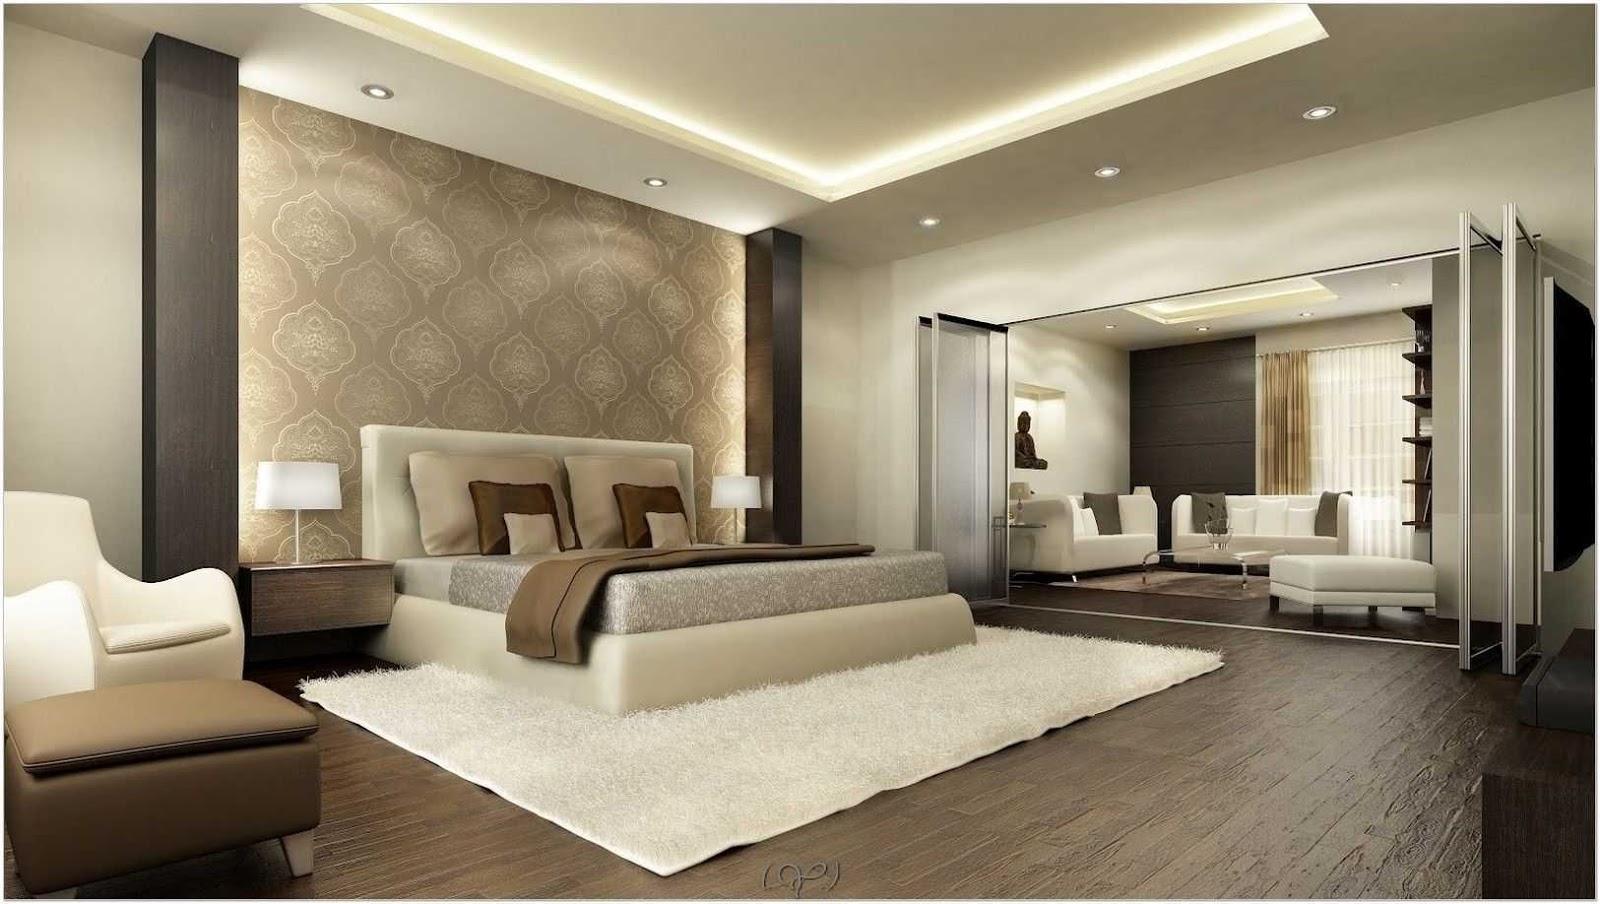 Foundation Dezin Decor Ceiling Design For Master Bedroom